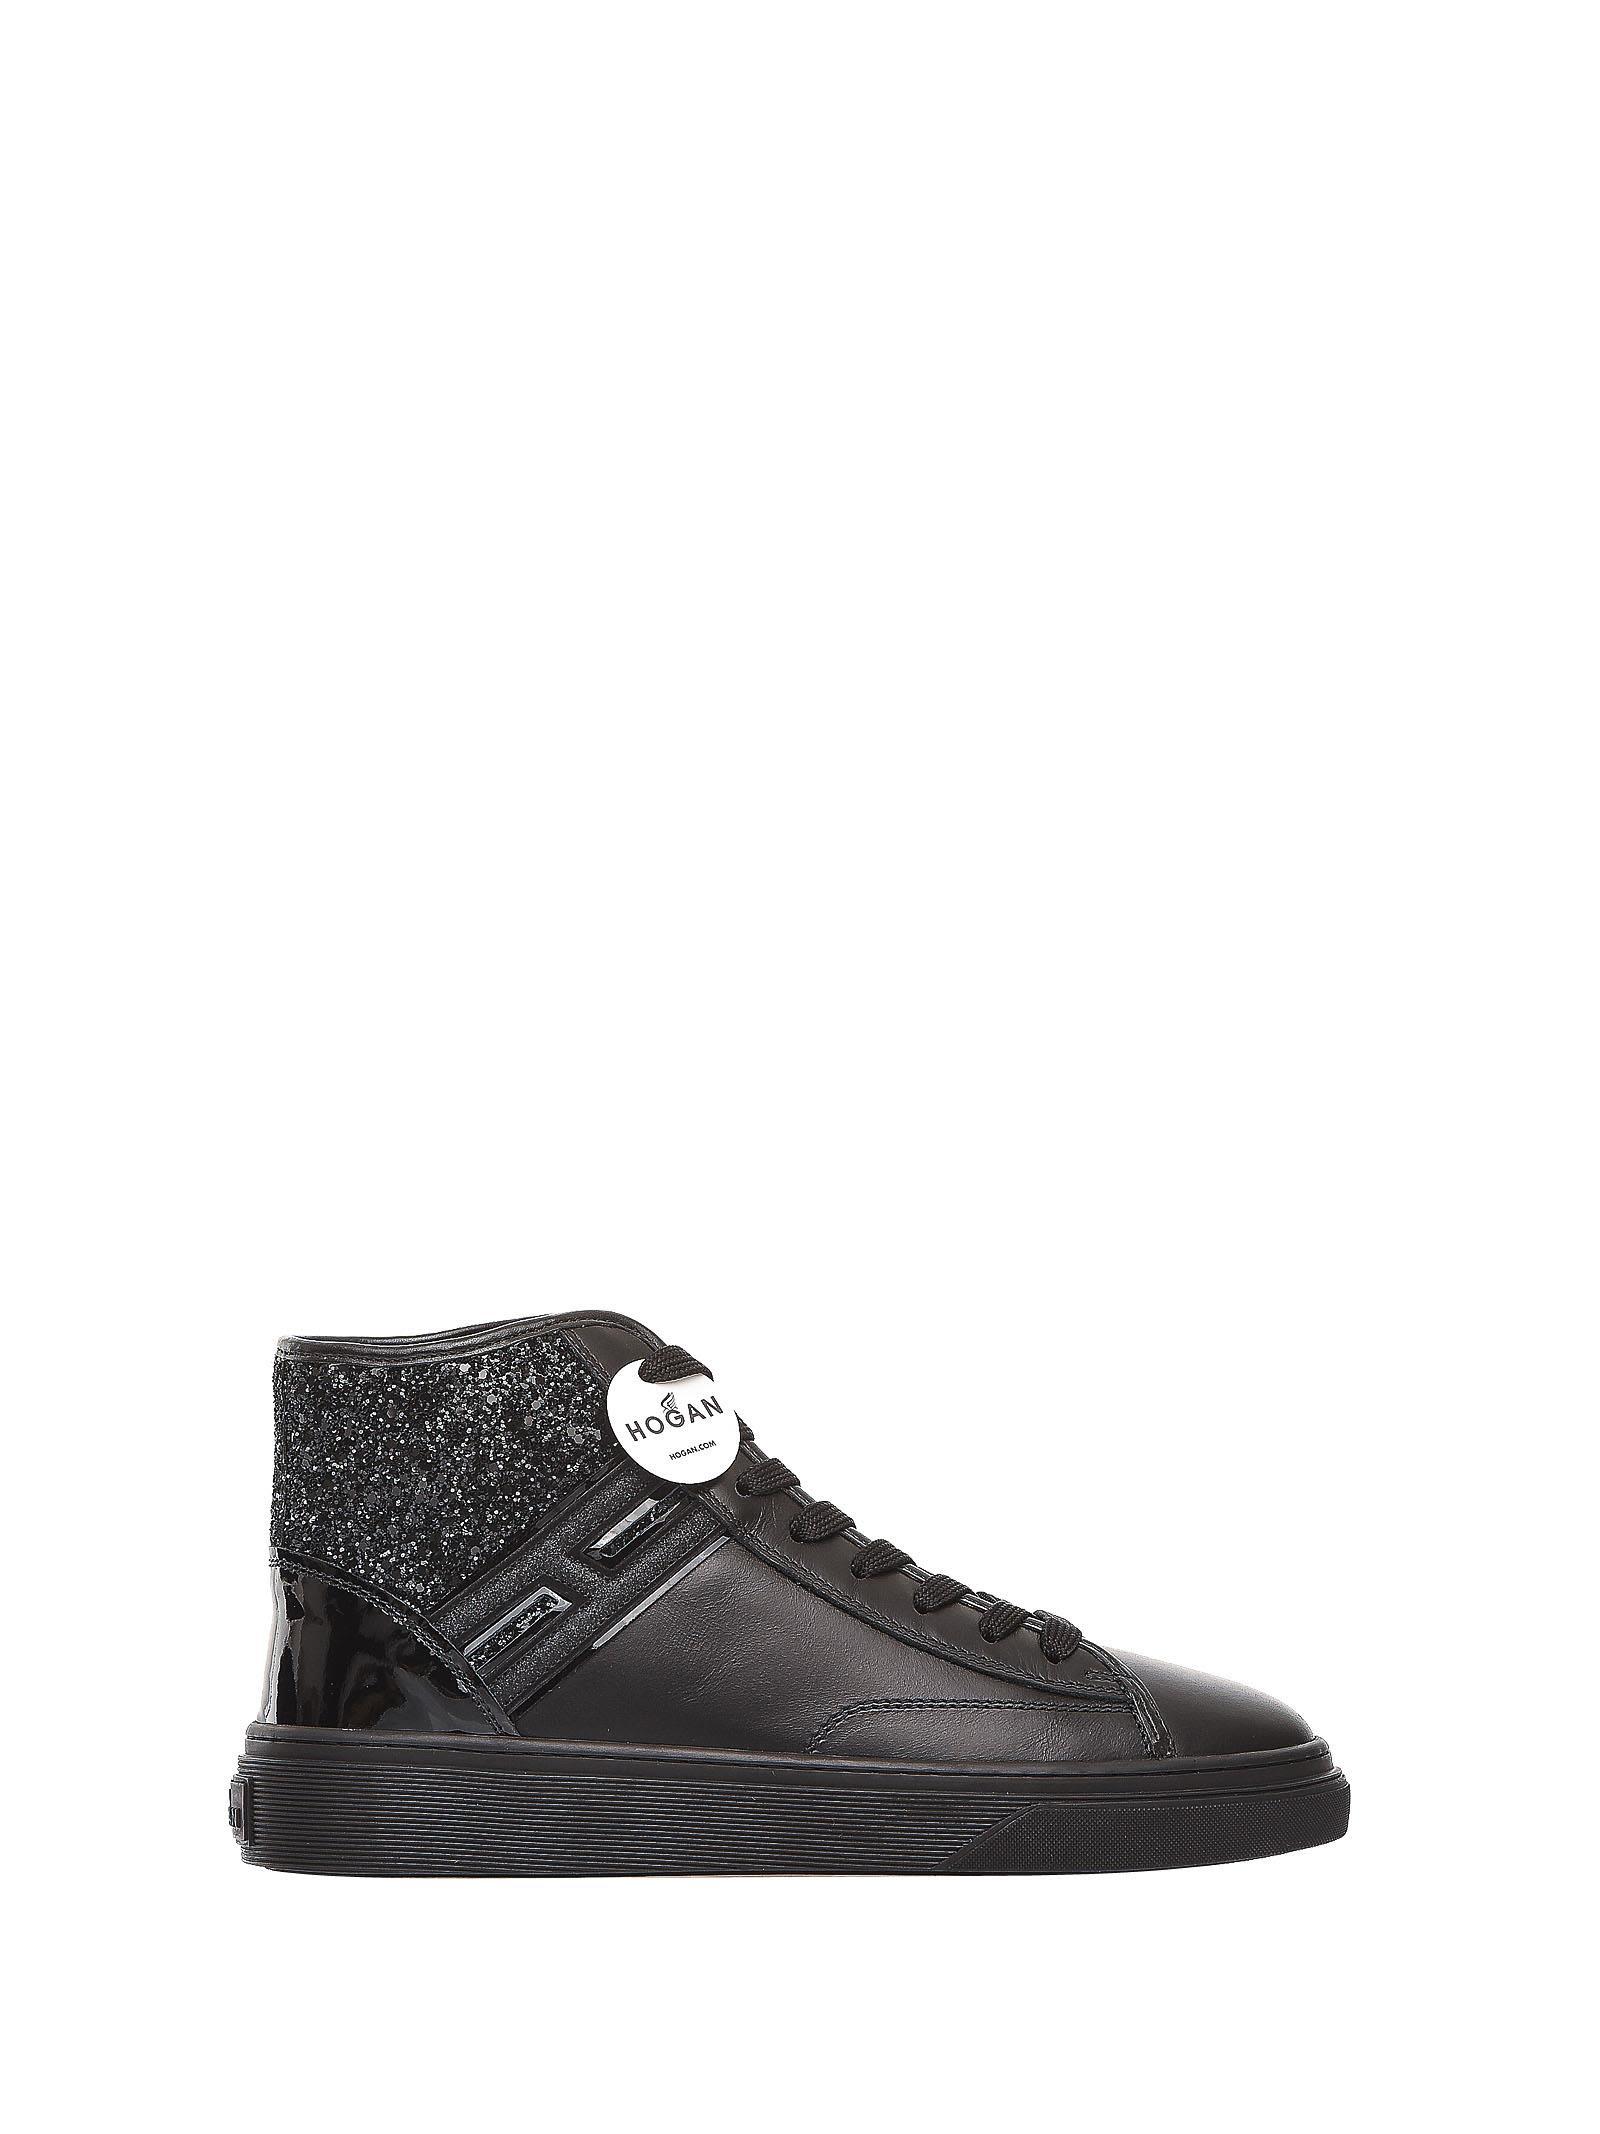 Hogan Sneakers H342 Black